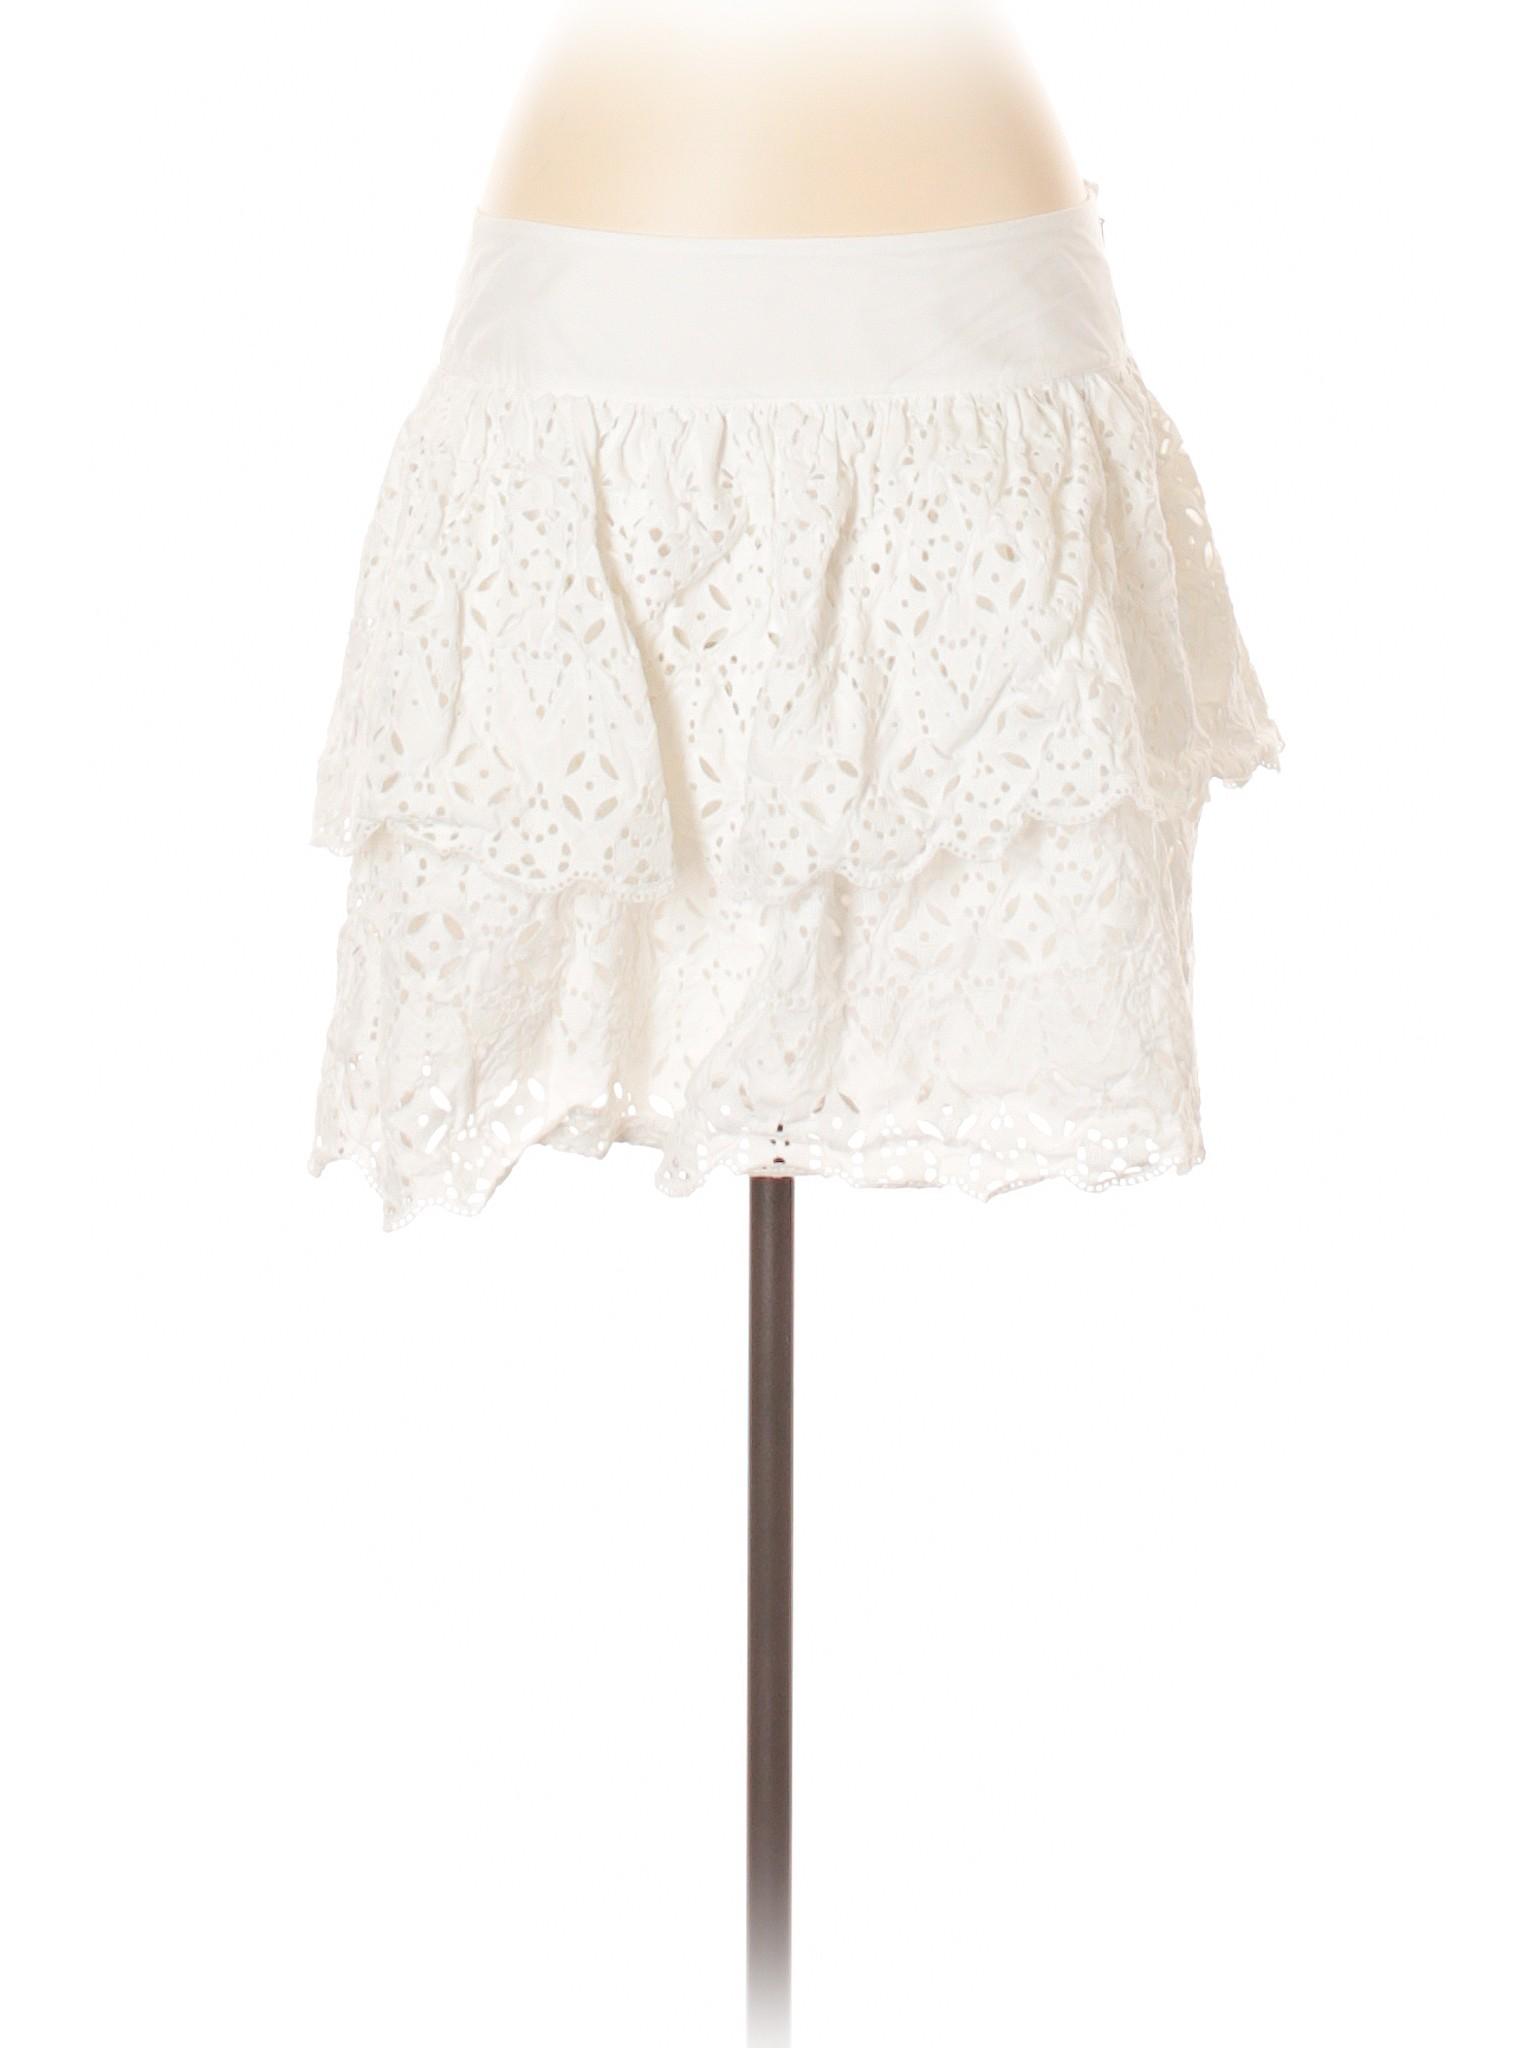 Boutique Casual Skirt Casual Casual Casual Boutique Boutique Skirt Skirt Boutique Casual Skirt Boutique dfrwCdqxZ